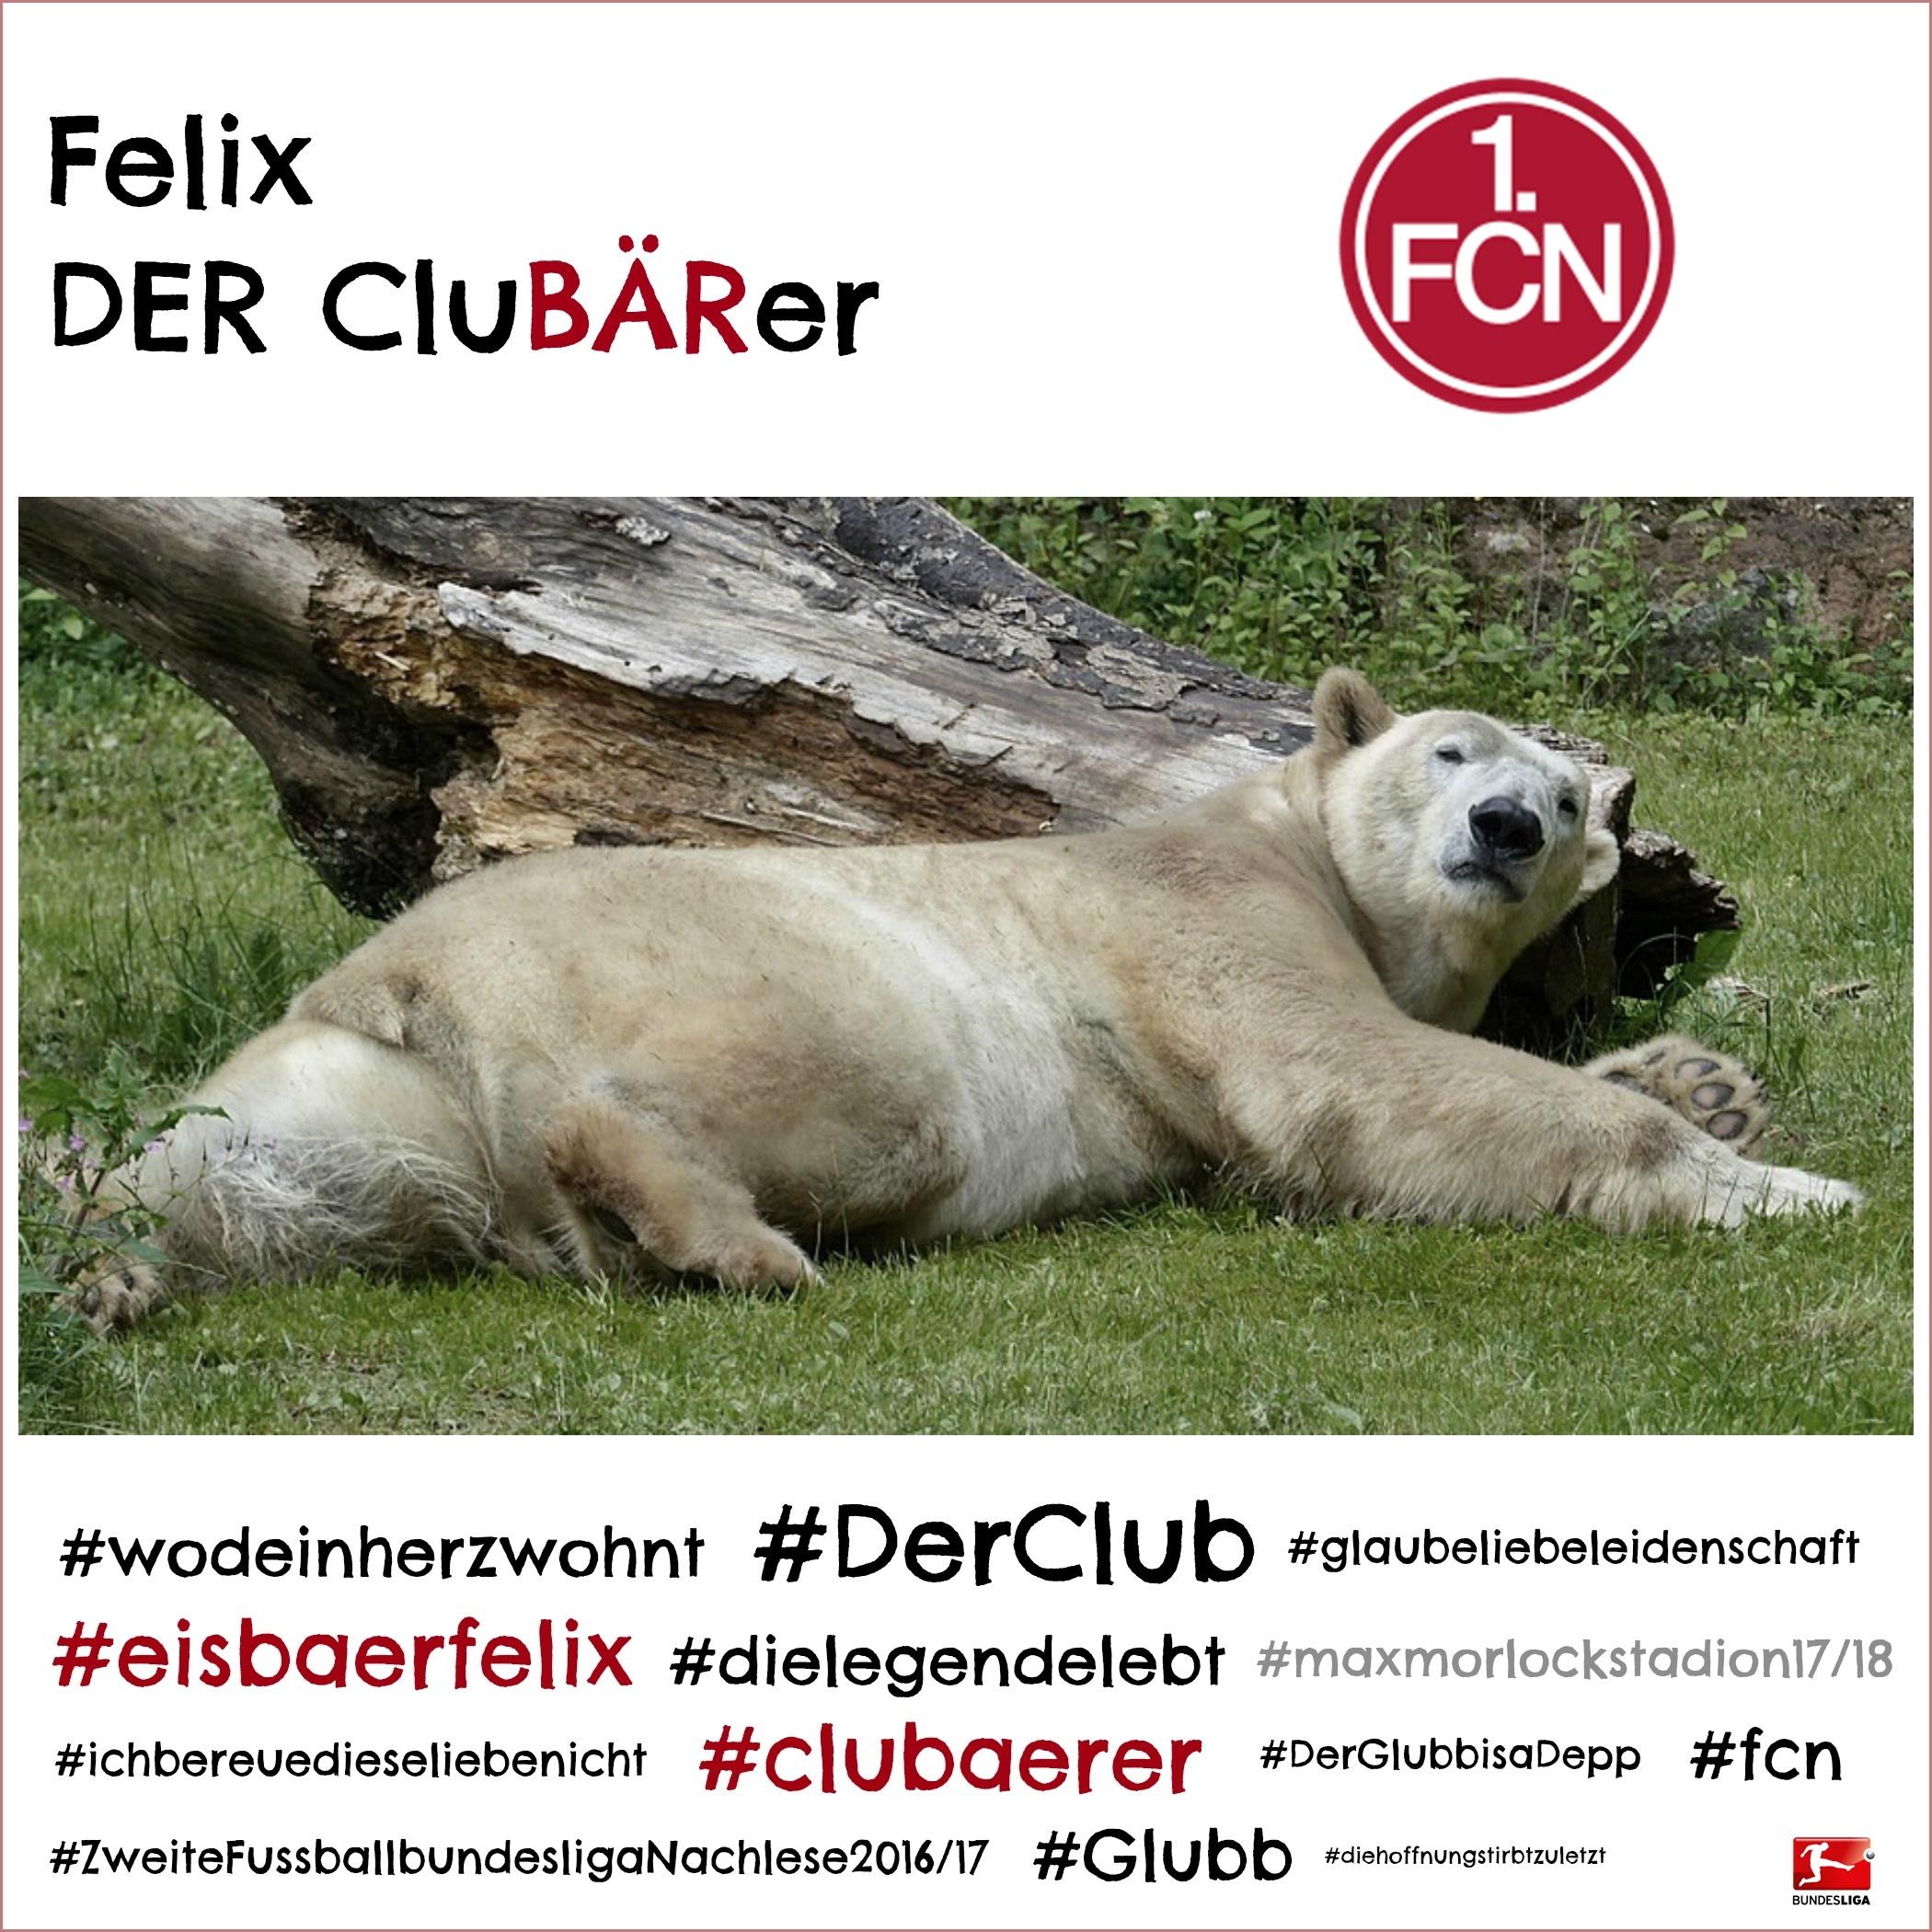 Fußball-Bundesliga 2016/2017 mit CluBÄRer Felix - Tiergarten Nürnberg